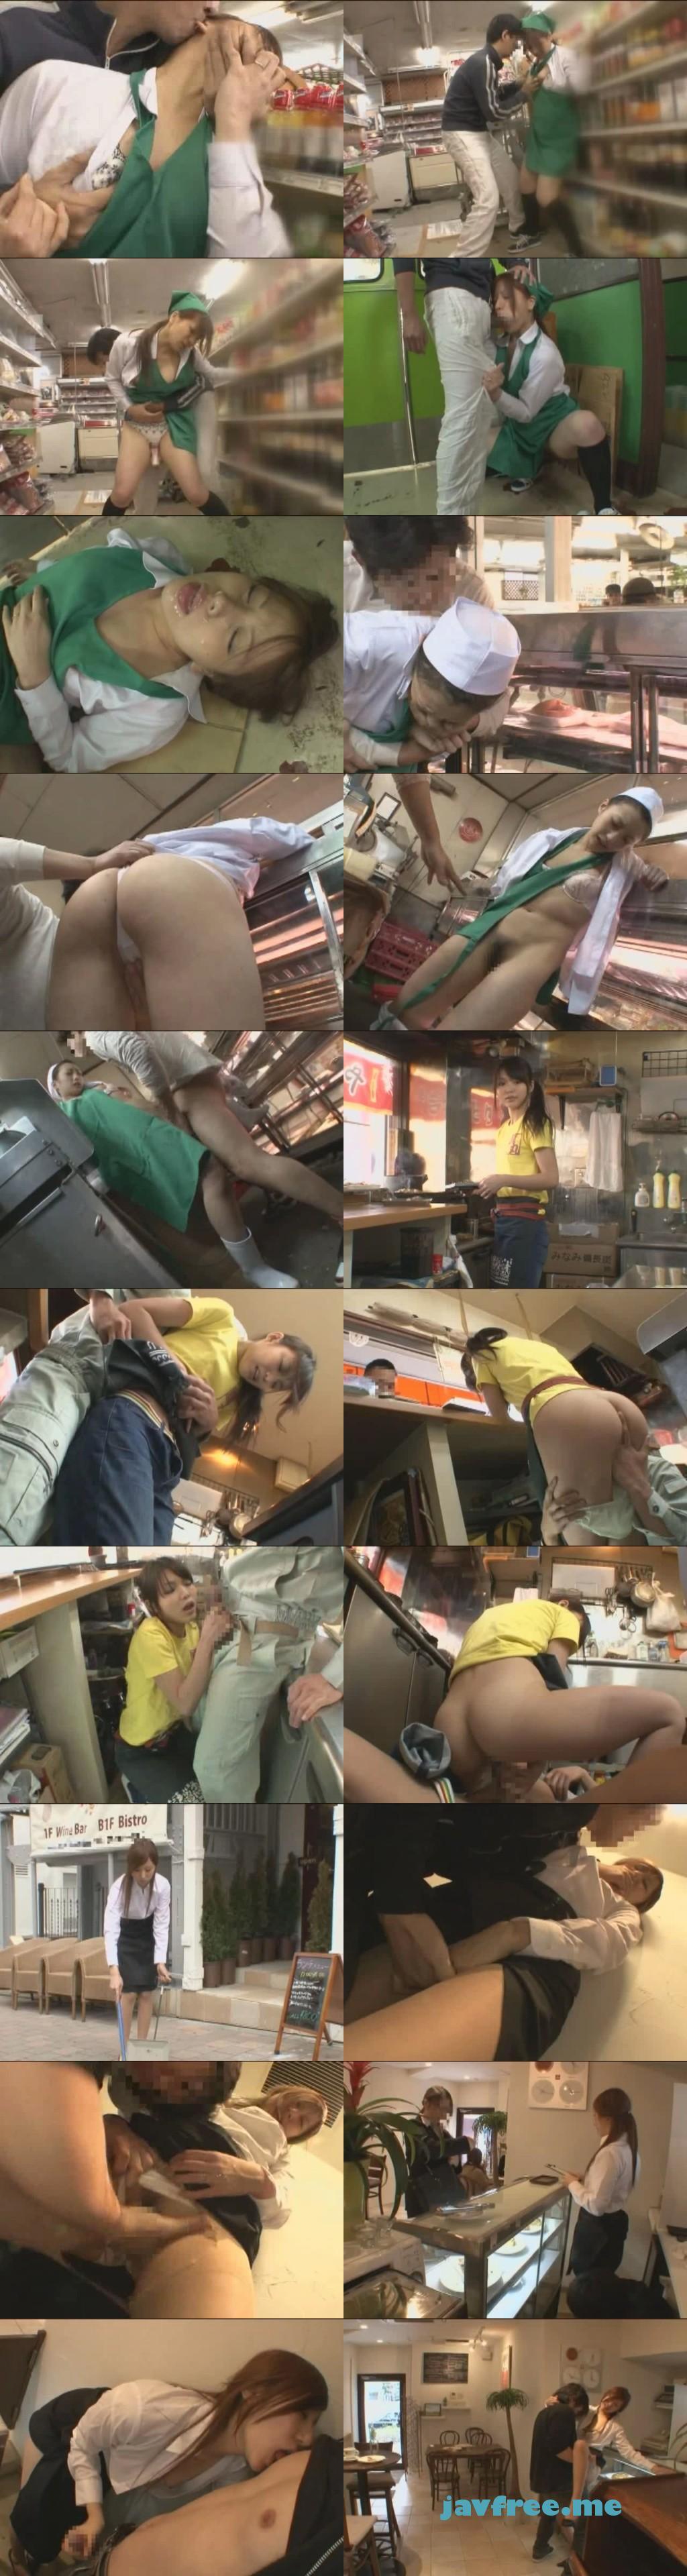 [NHDTA-252] 接客中に顔を紅潮させながら感じまくるパート妻 ~スーパーレジ、精肉コーナー、カフェ、焼き鳥屋~ - image NHDTA252 on https://javfree.me